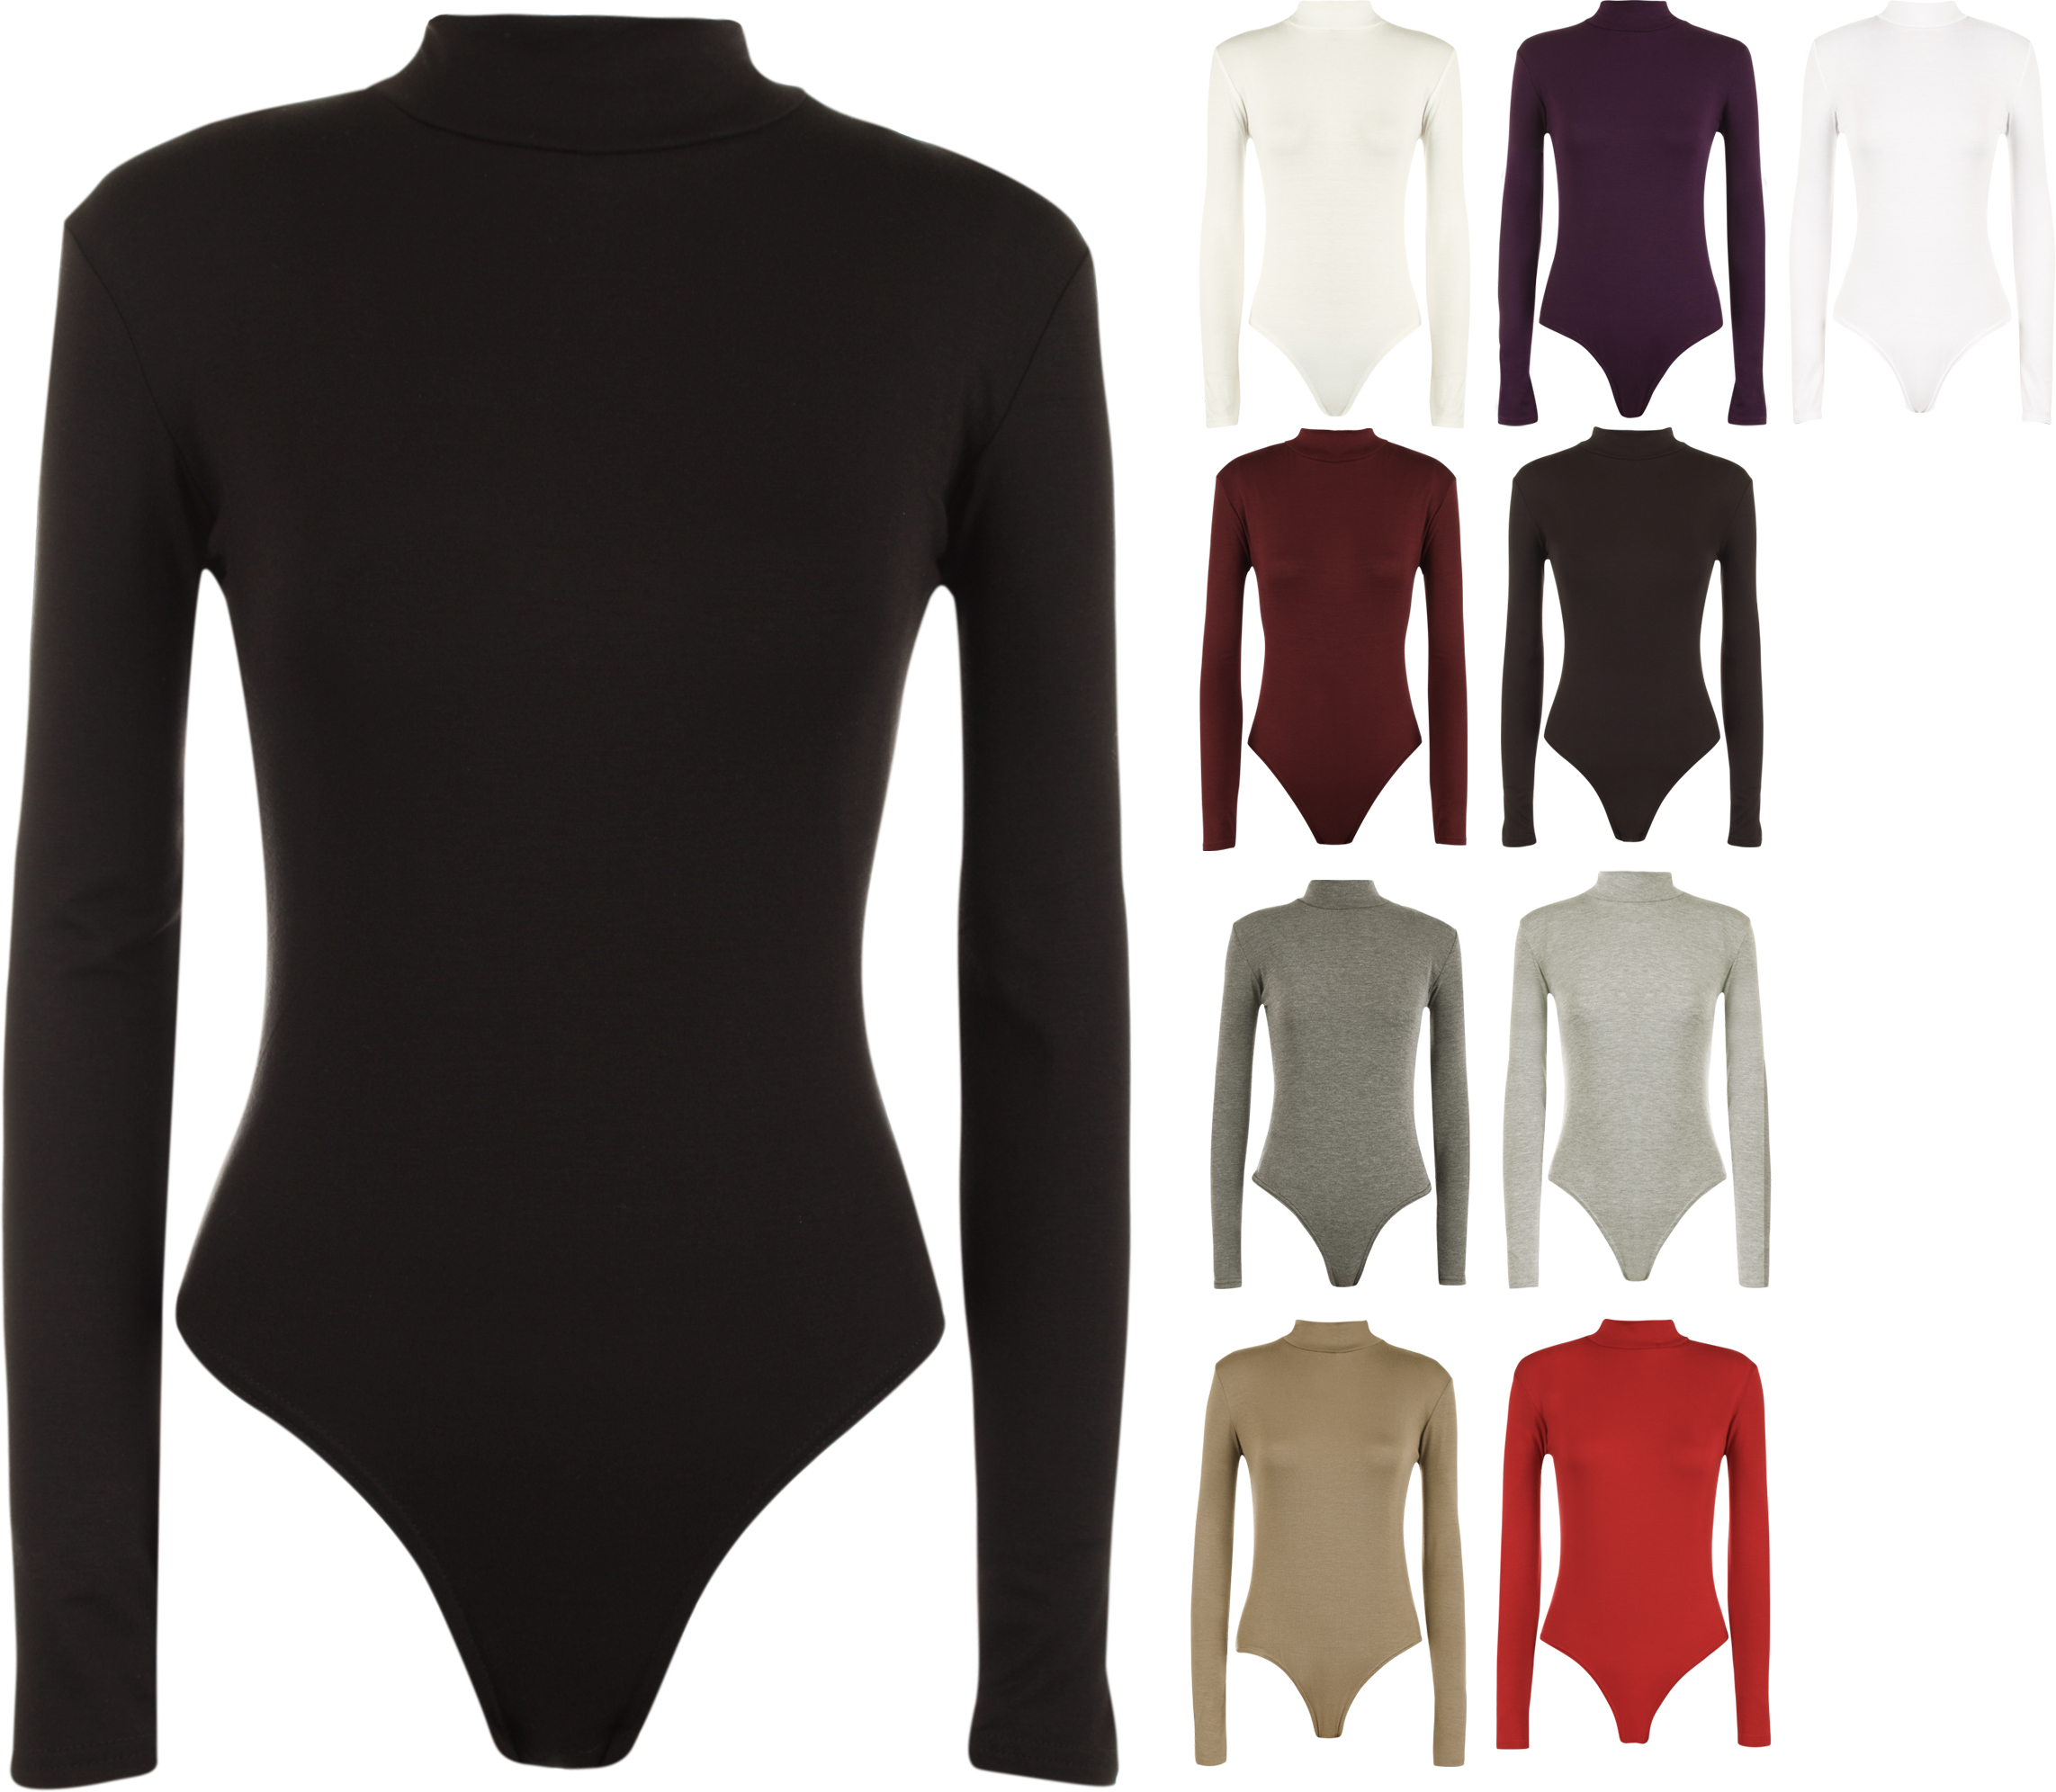 New-Womens-Turtle-Neck-Bodysuit-Ladies-Long-Sleeve-Stretch-Leotard-Top-8-14